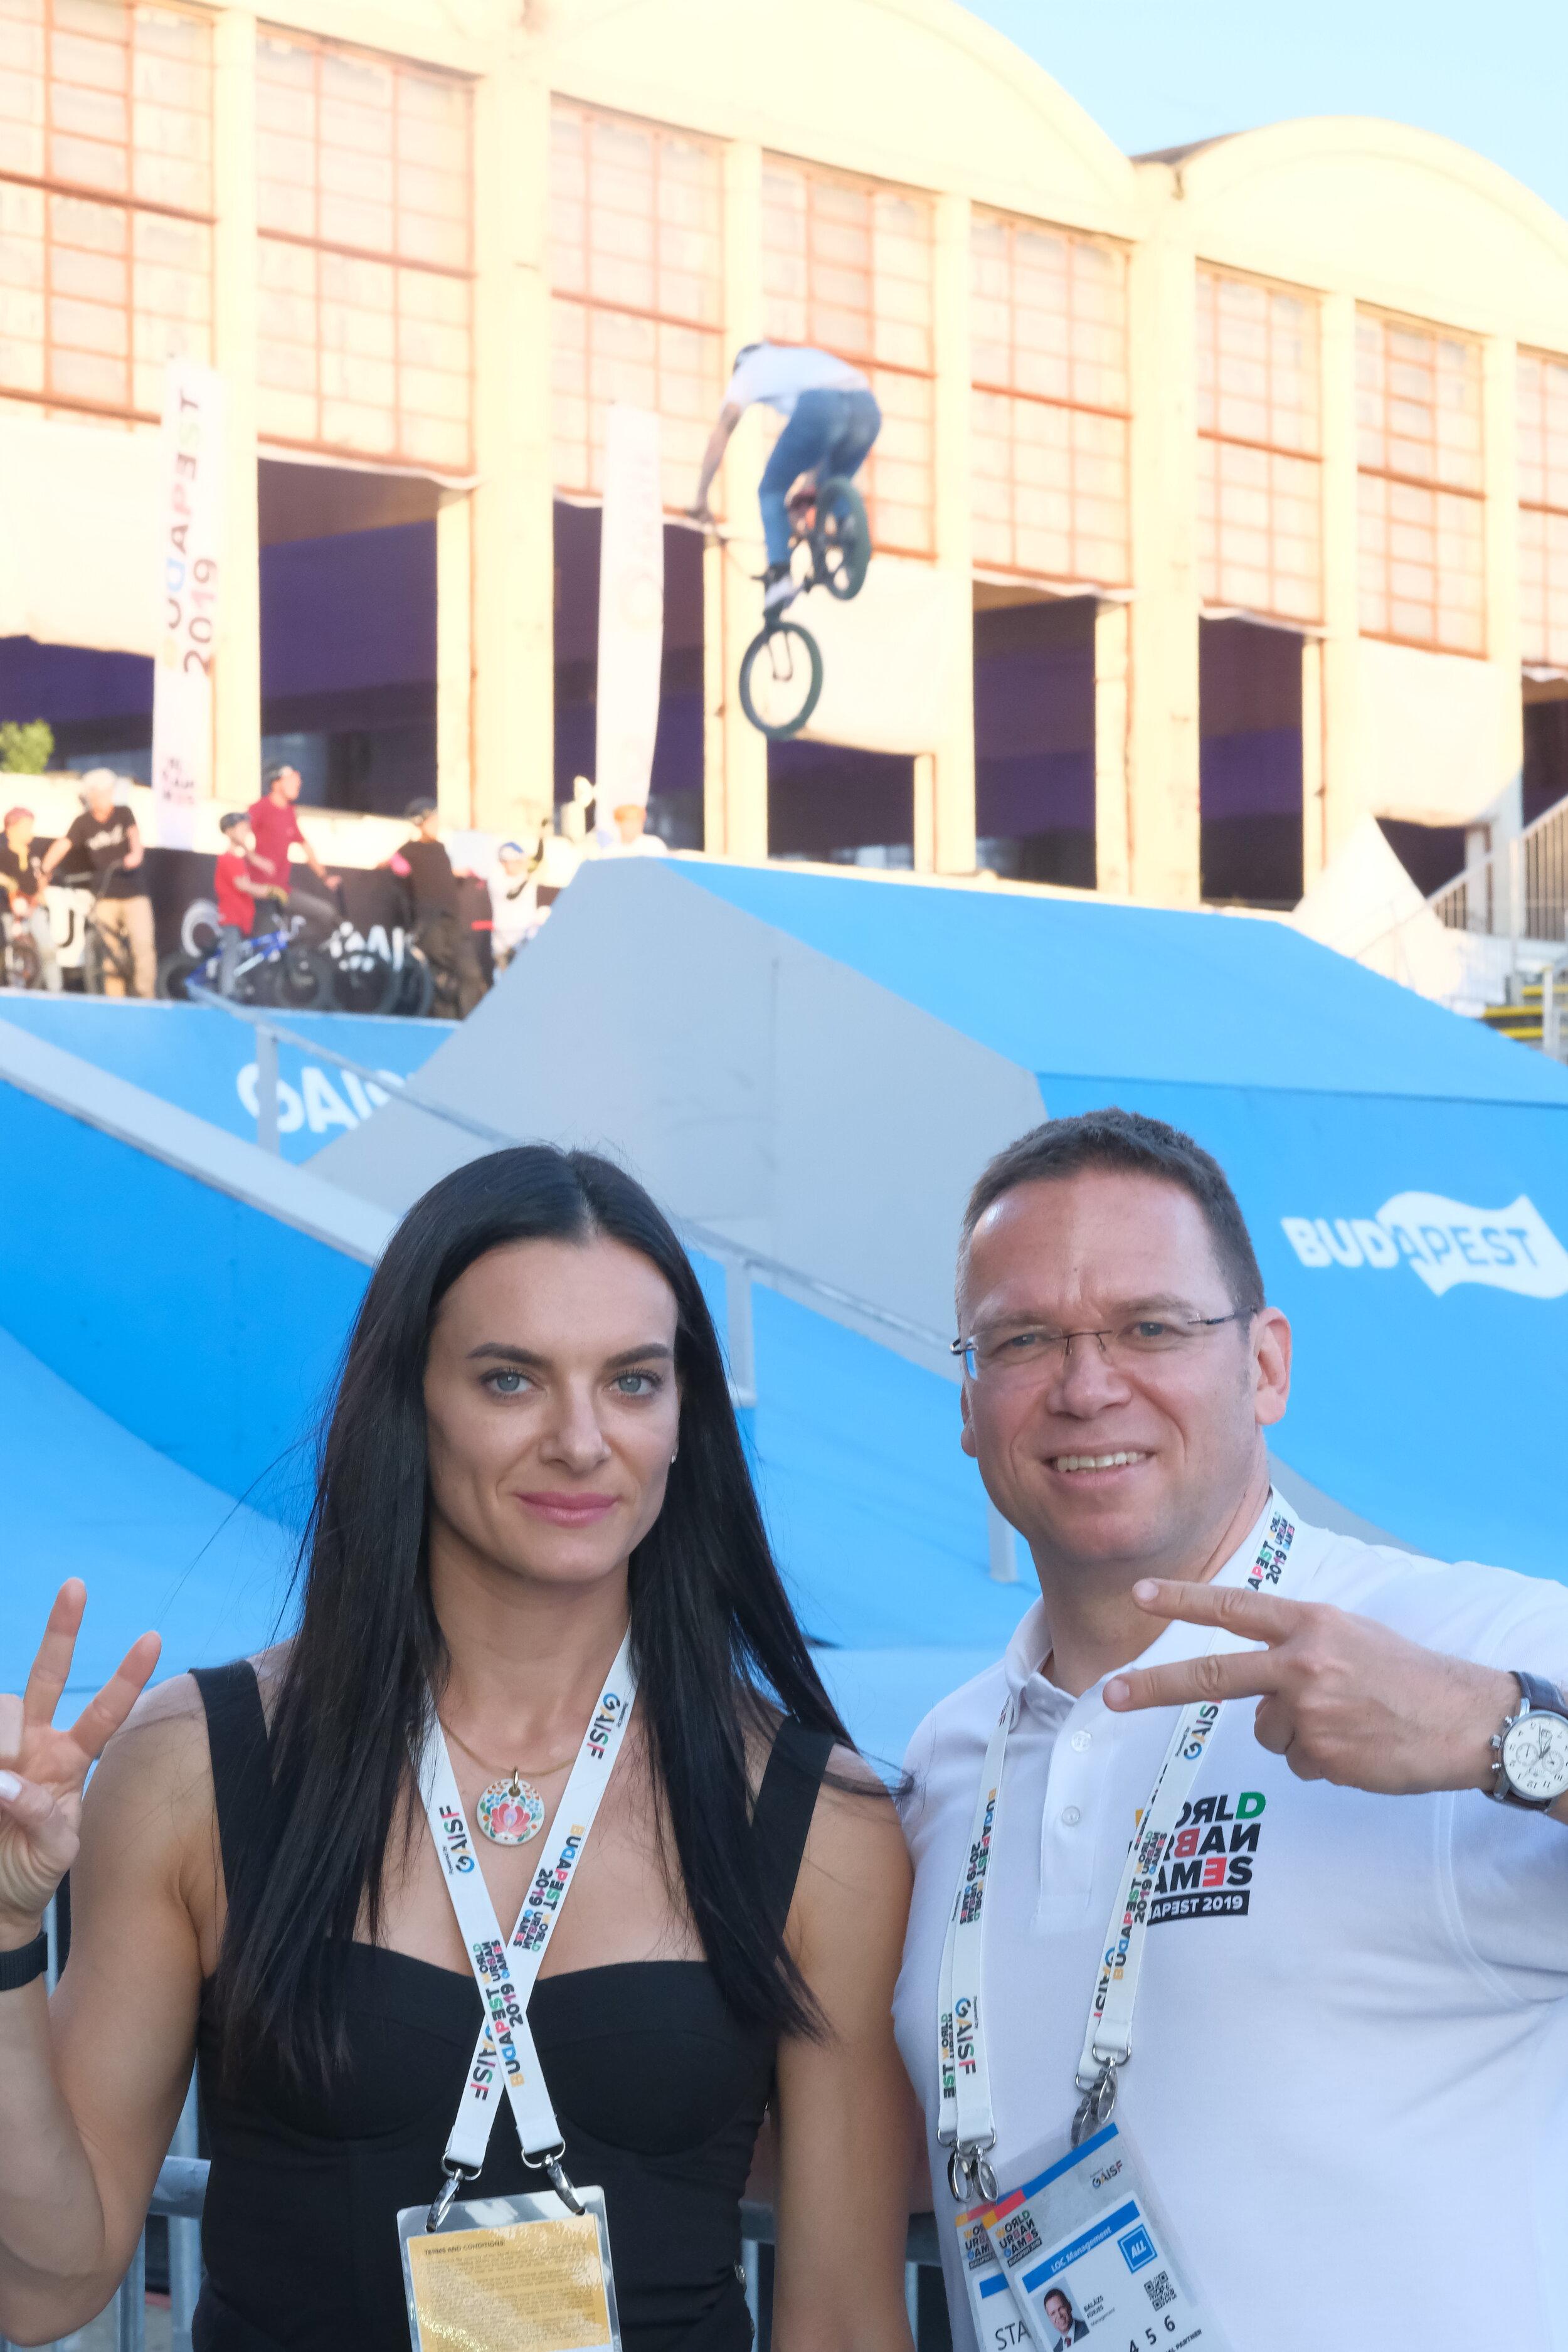 Yelena Isinbayeva and Balazs Fürjes at the World Urban Games BMX Freestyle venue // photo by ODPictures